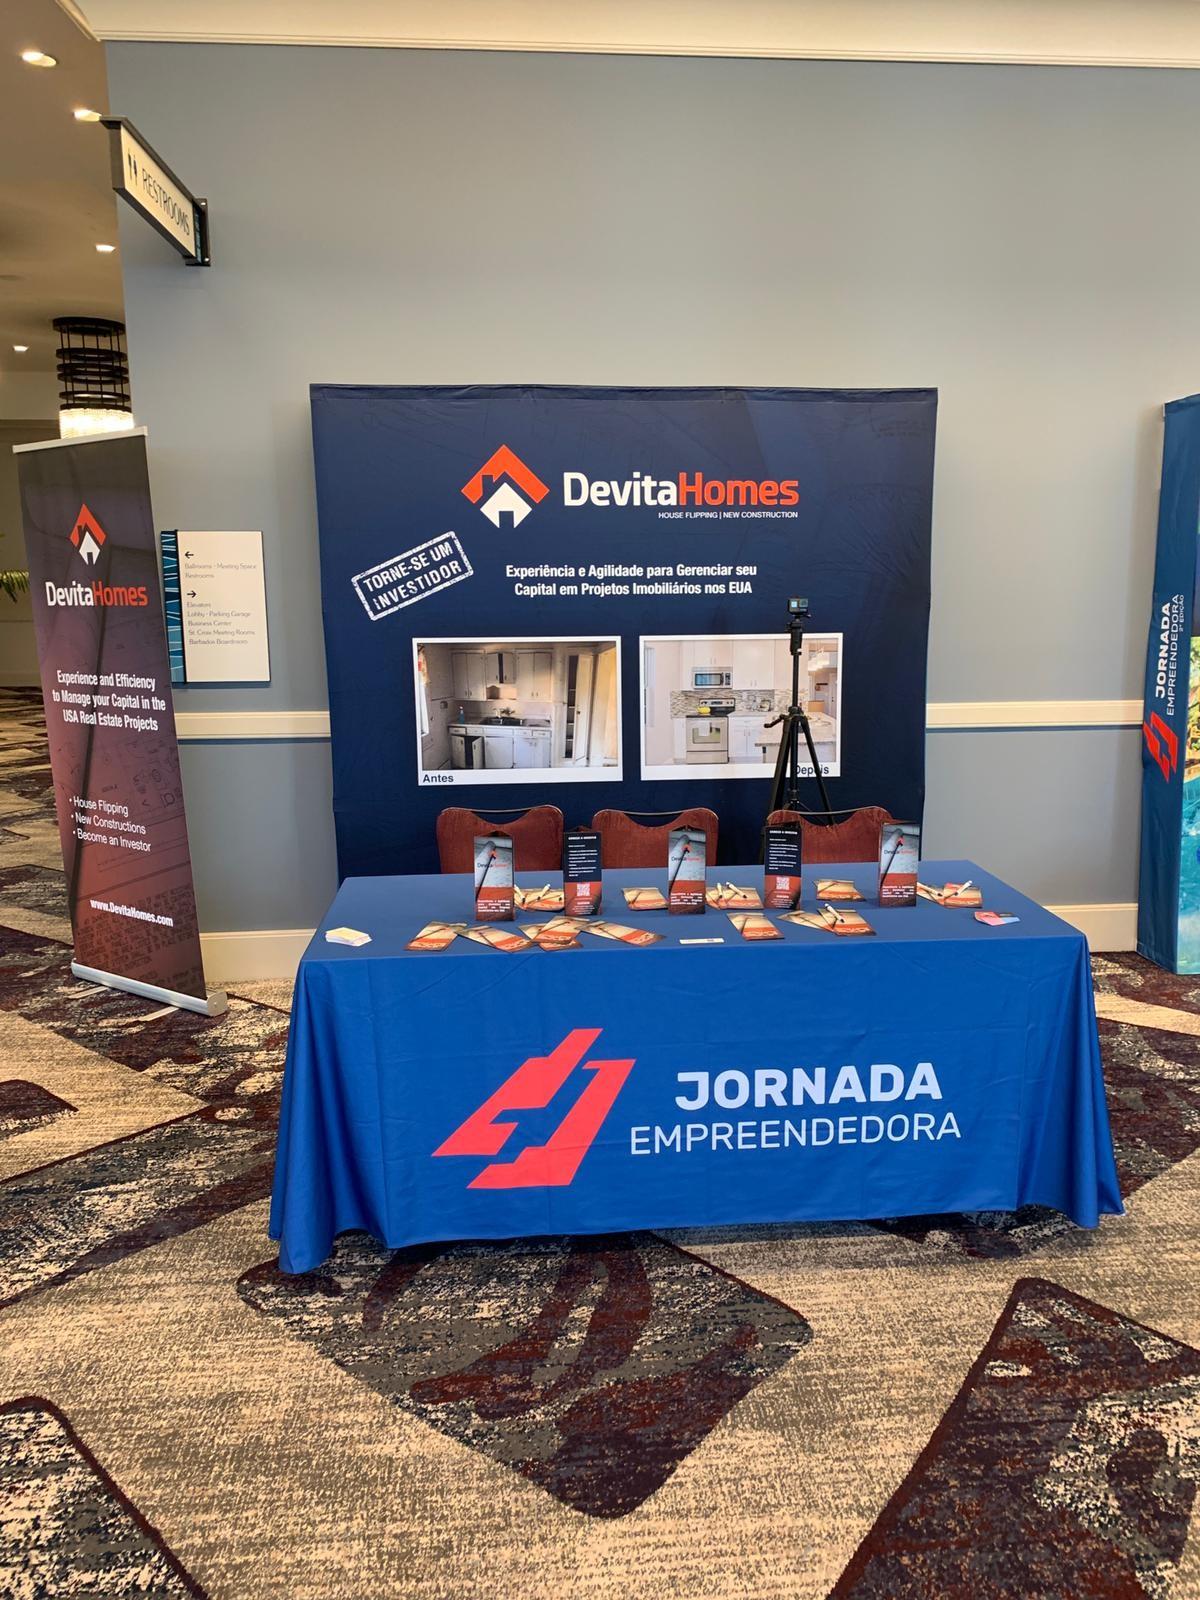 Trade Show Booths | Convention & Exhibit Signs | Builder & Contractor Signs | Orlando, FL